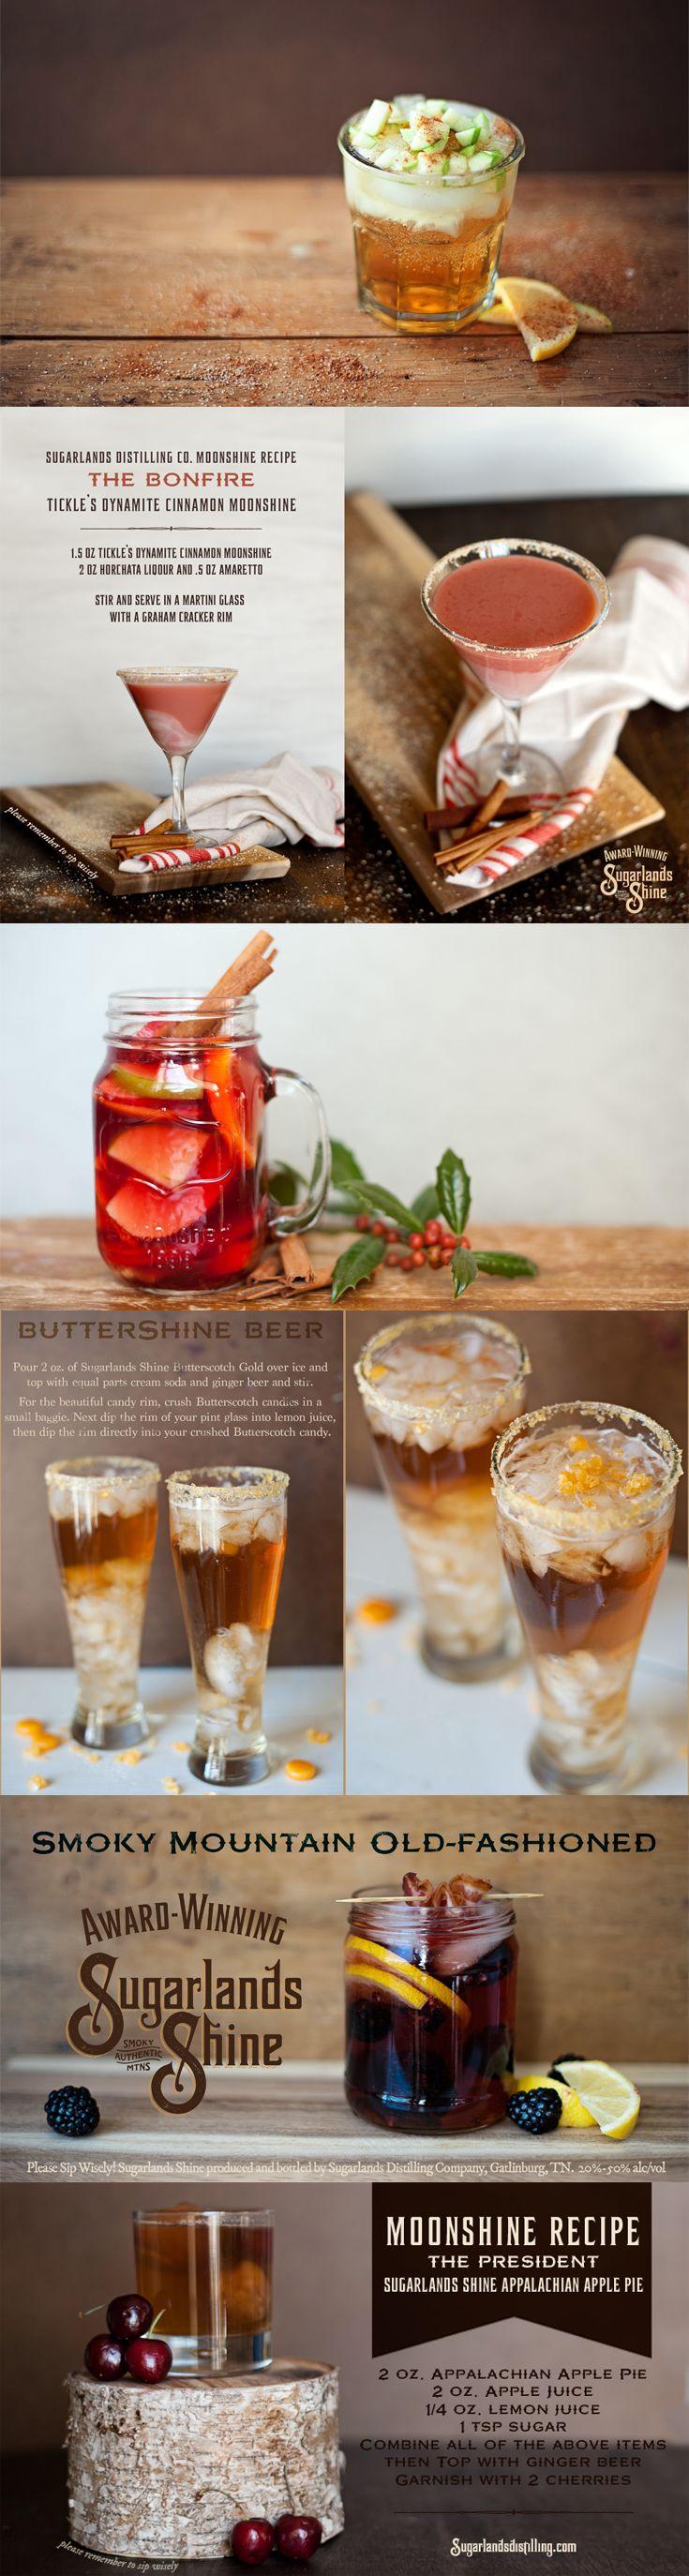 Moonshine Cocktail Recipes. Sugarlands Harvest. The Bonfire. Apple Shine…